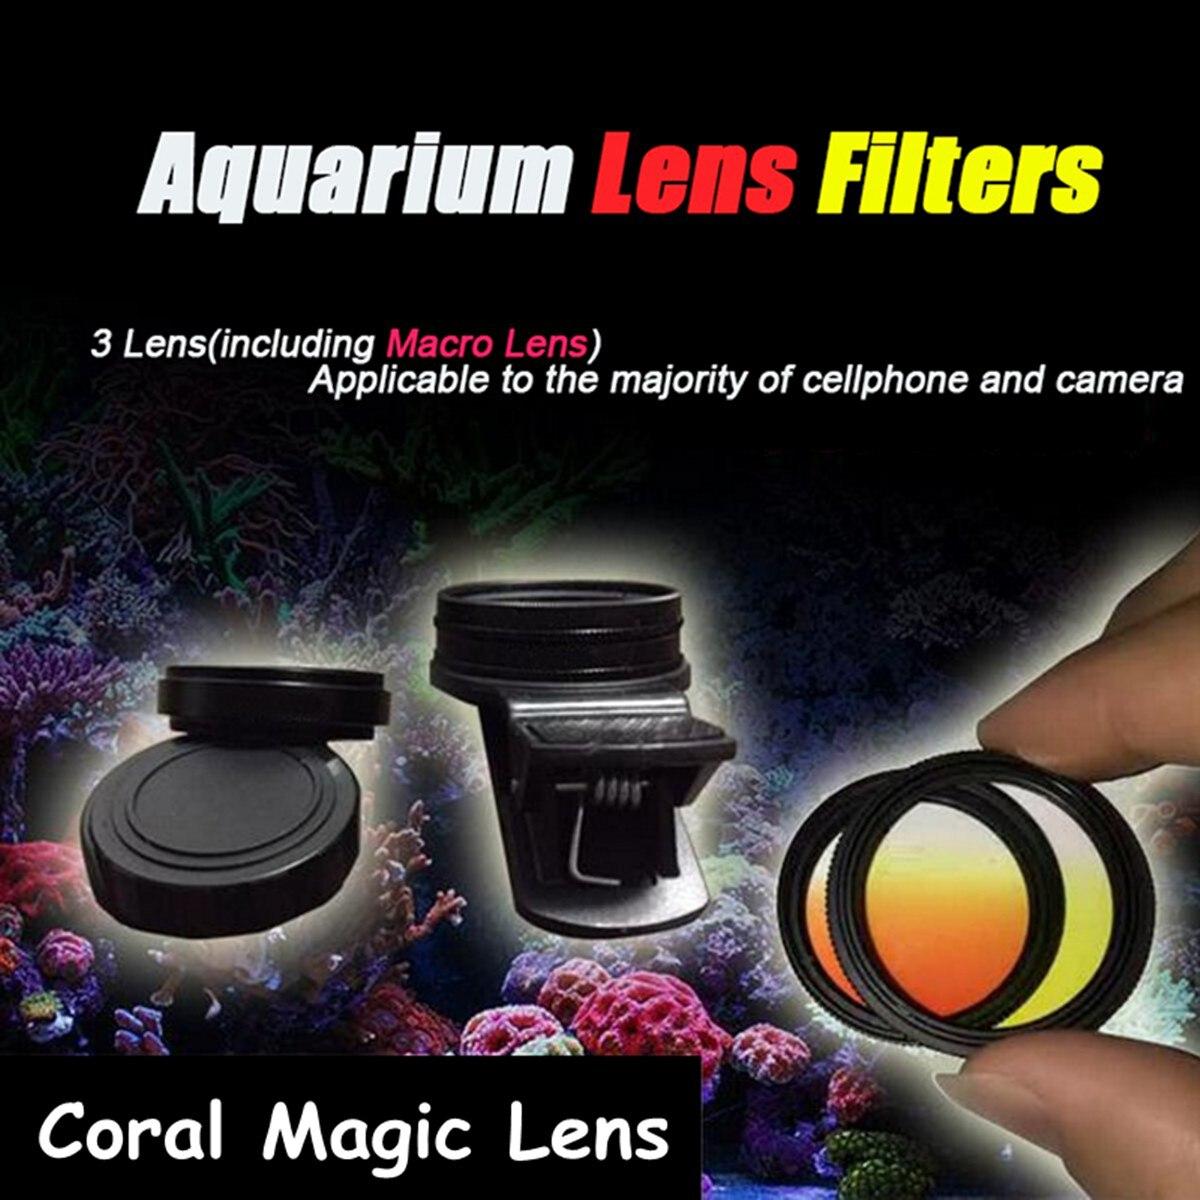 Acuario acuario peces arrecife de Coral lente mágico lentes de filtro de cámara de teléfono + 1 lente Macro Peces Accesorios Para terrario acuático